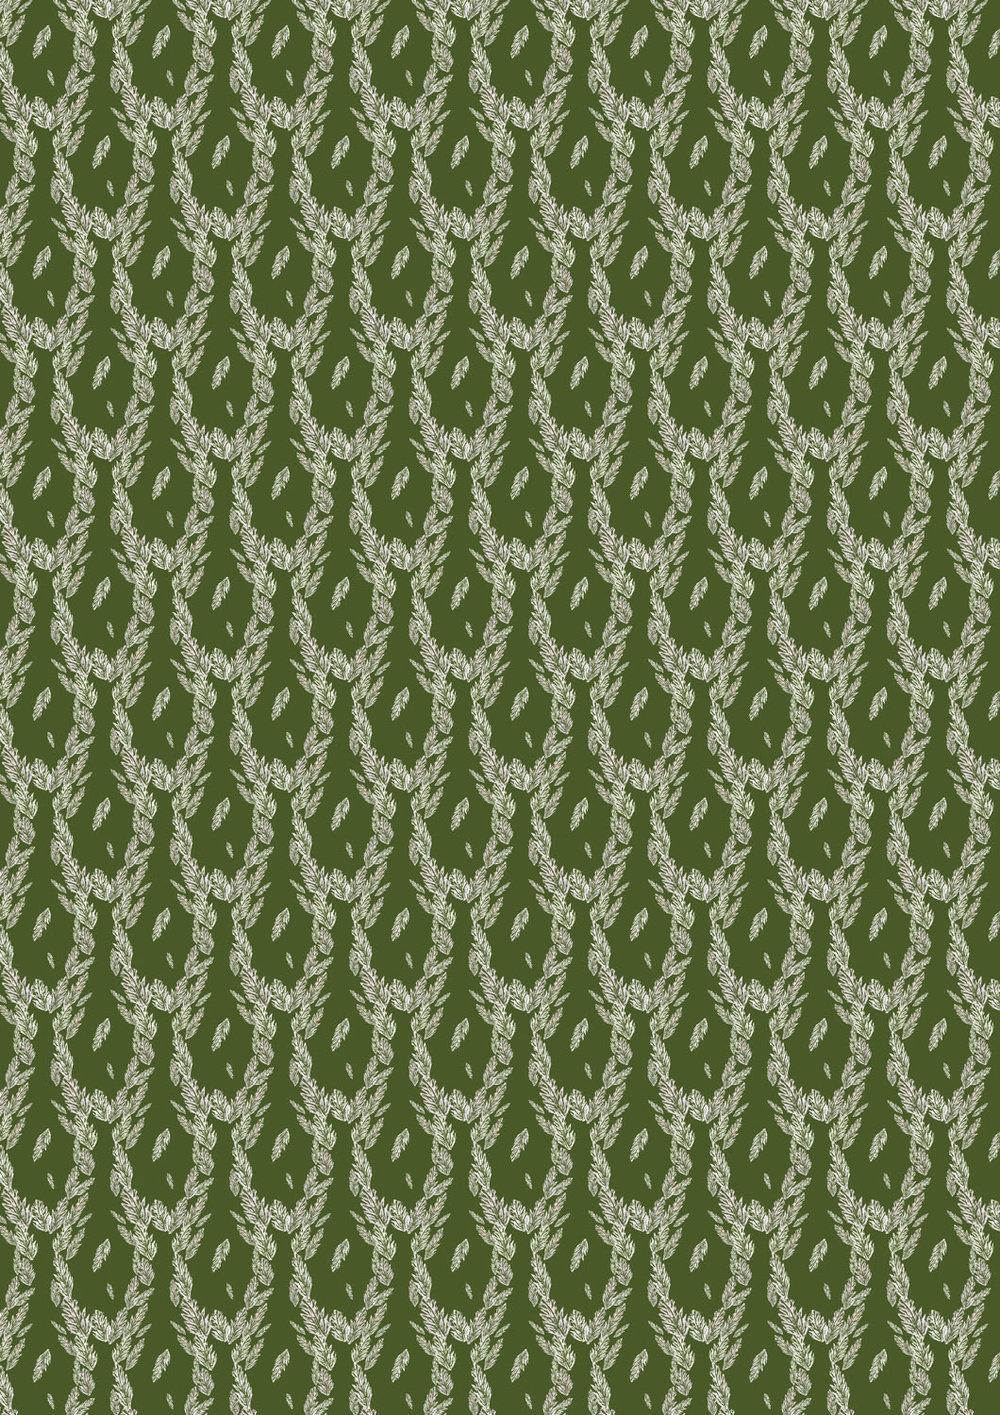 Plumage - Olive